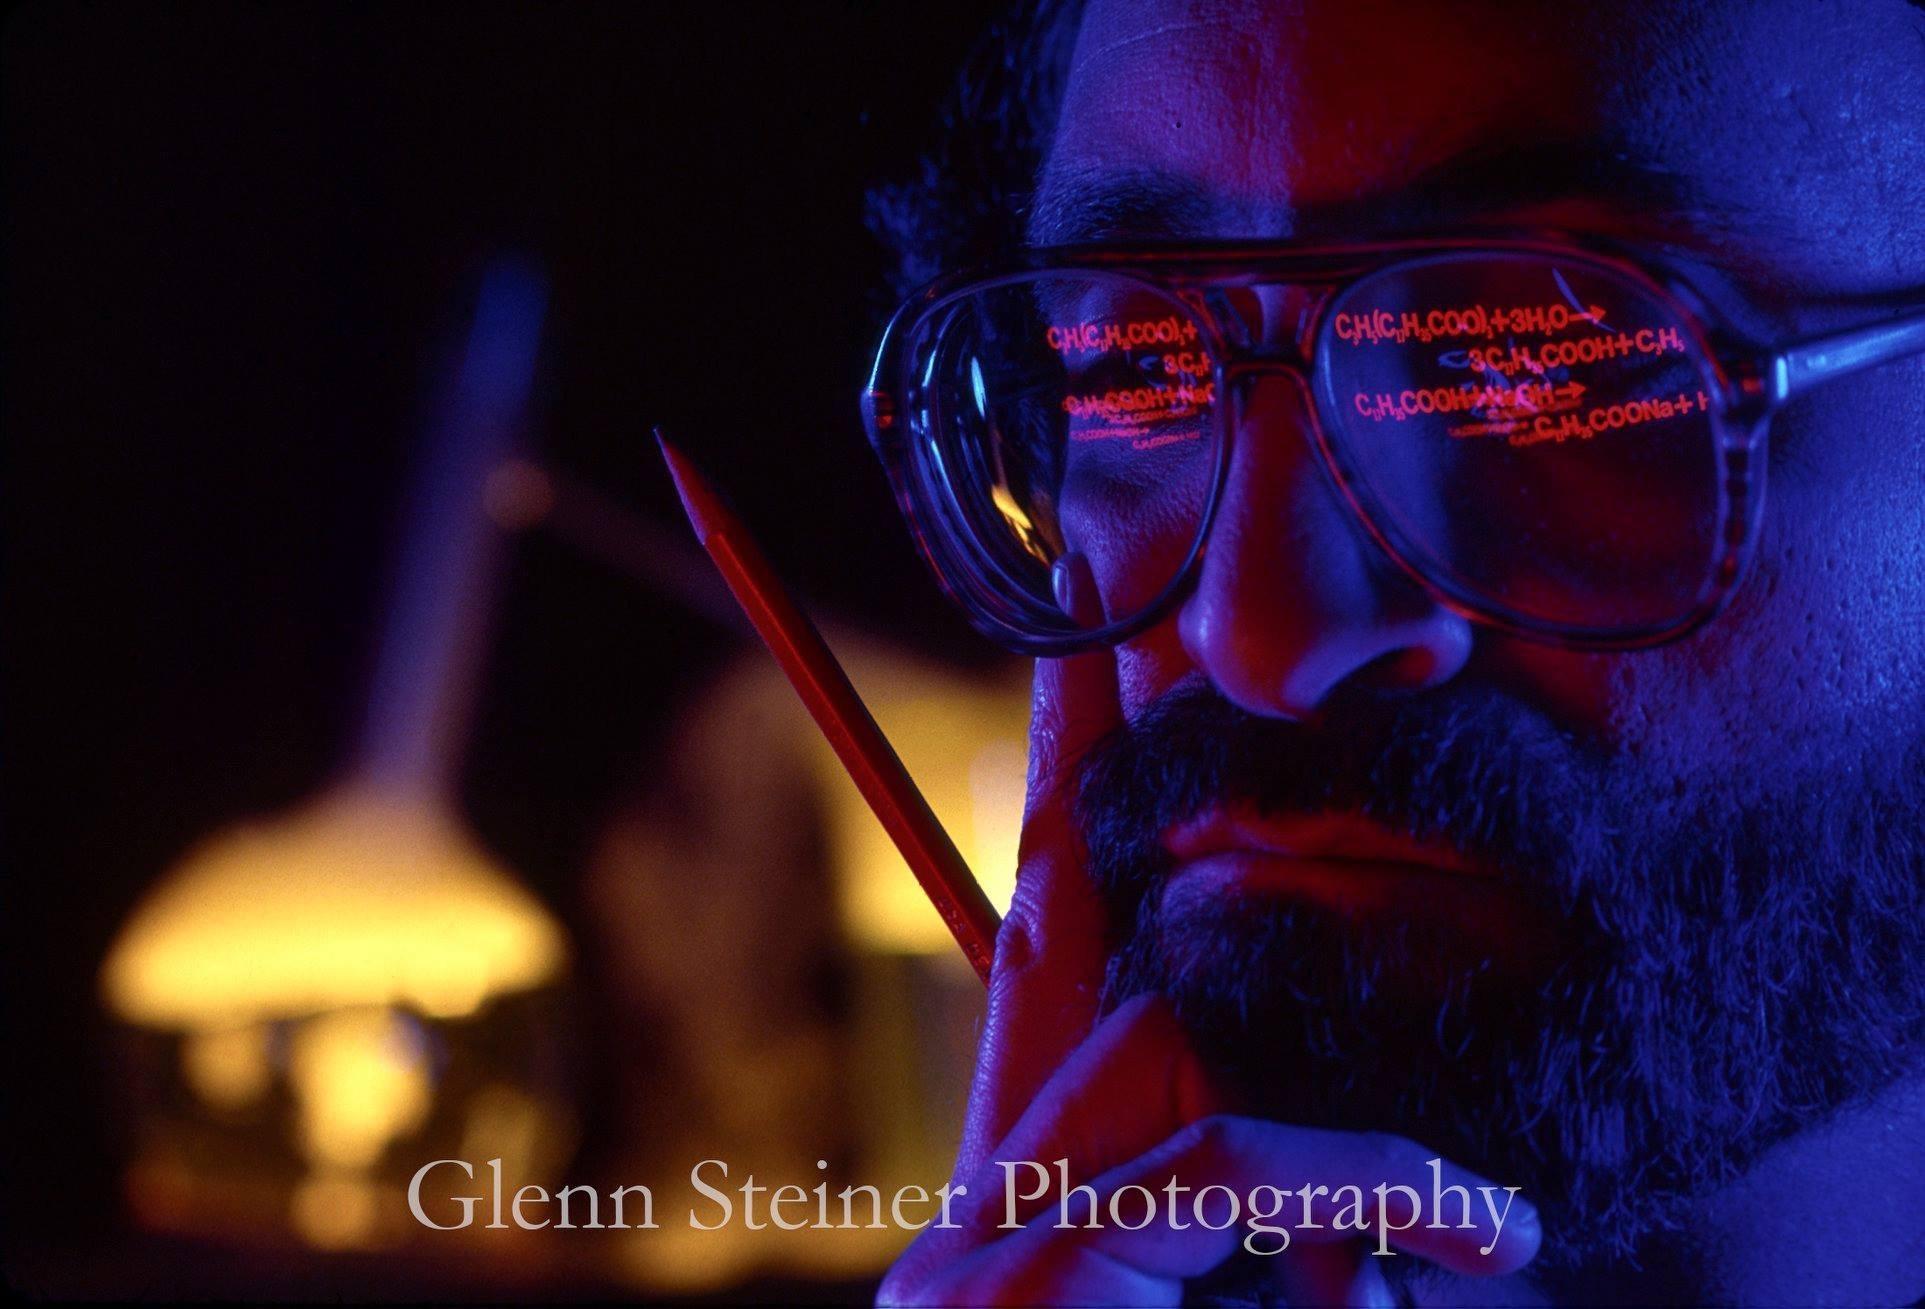 Future of Chemistry by Glenn Steiner